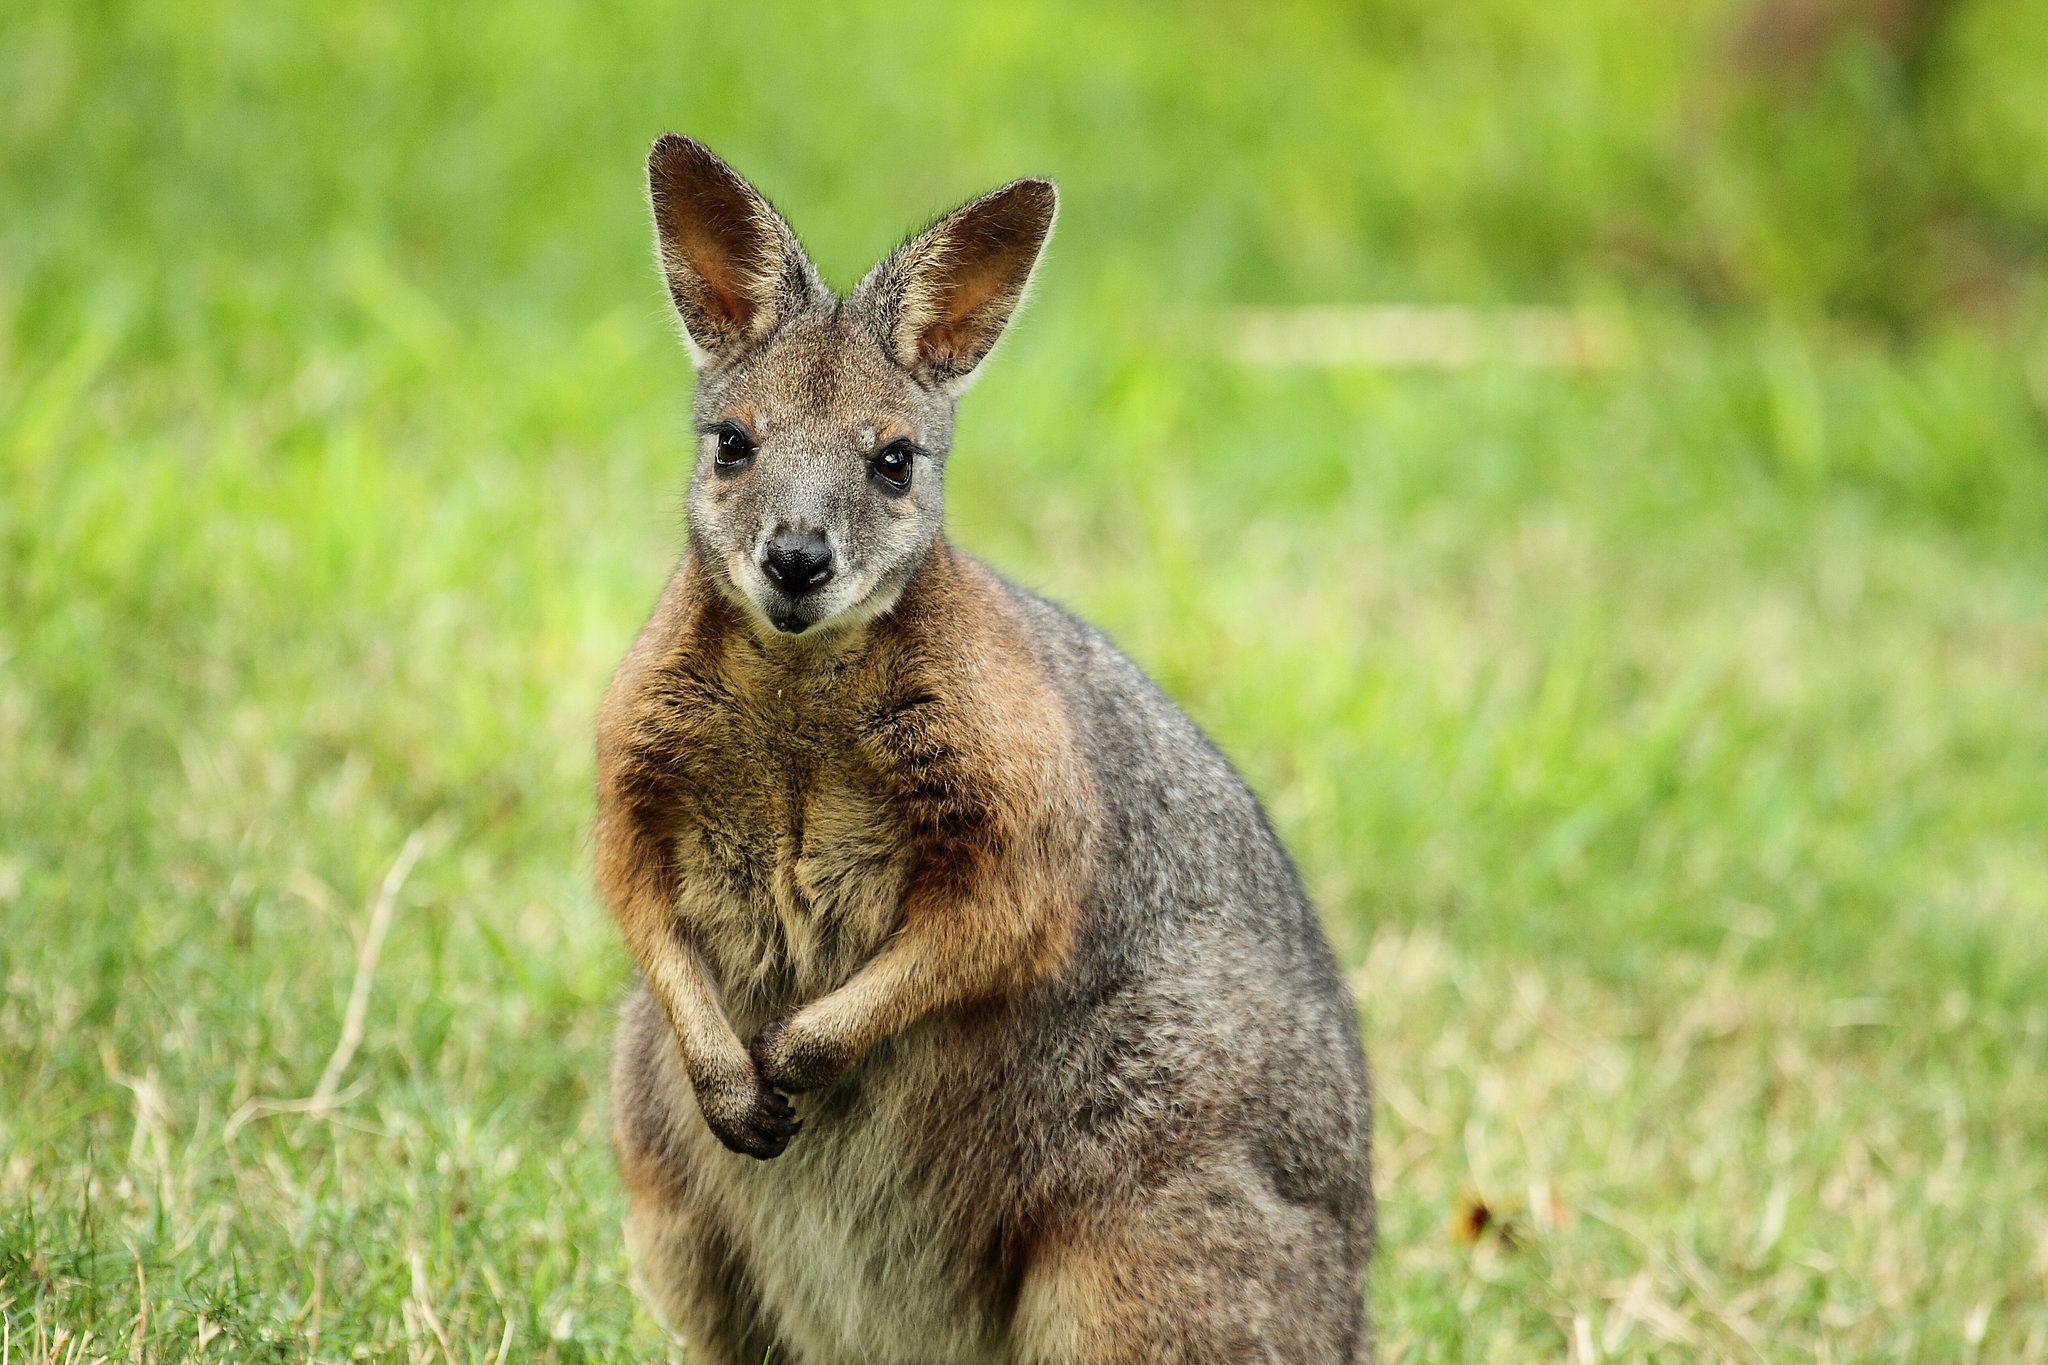 Животное похожее на кенгуру картинки